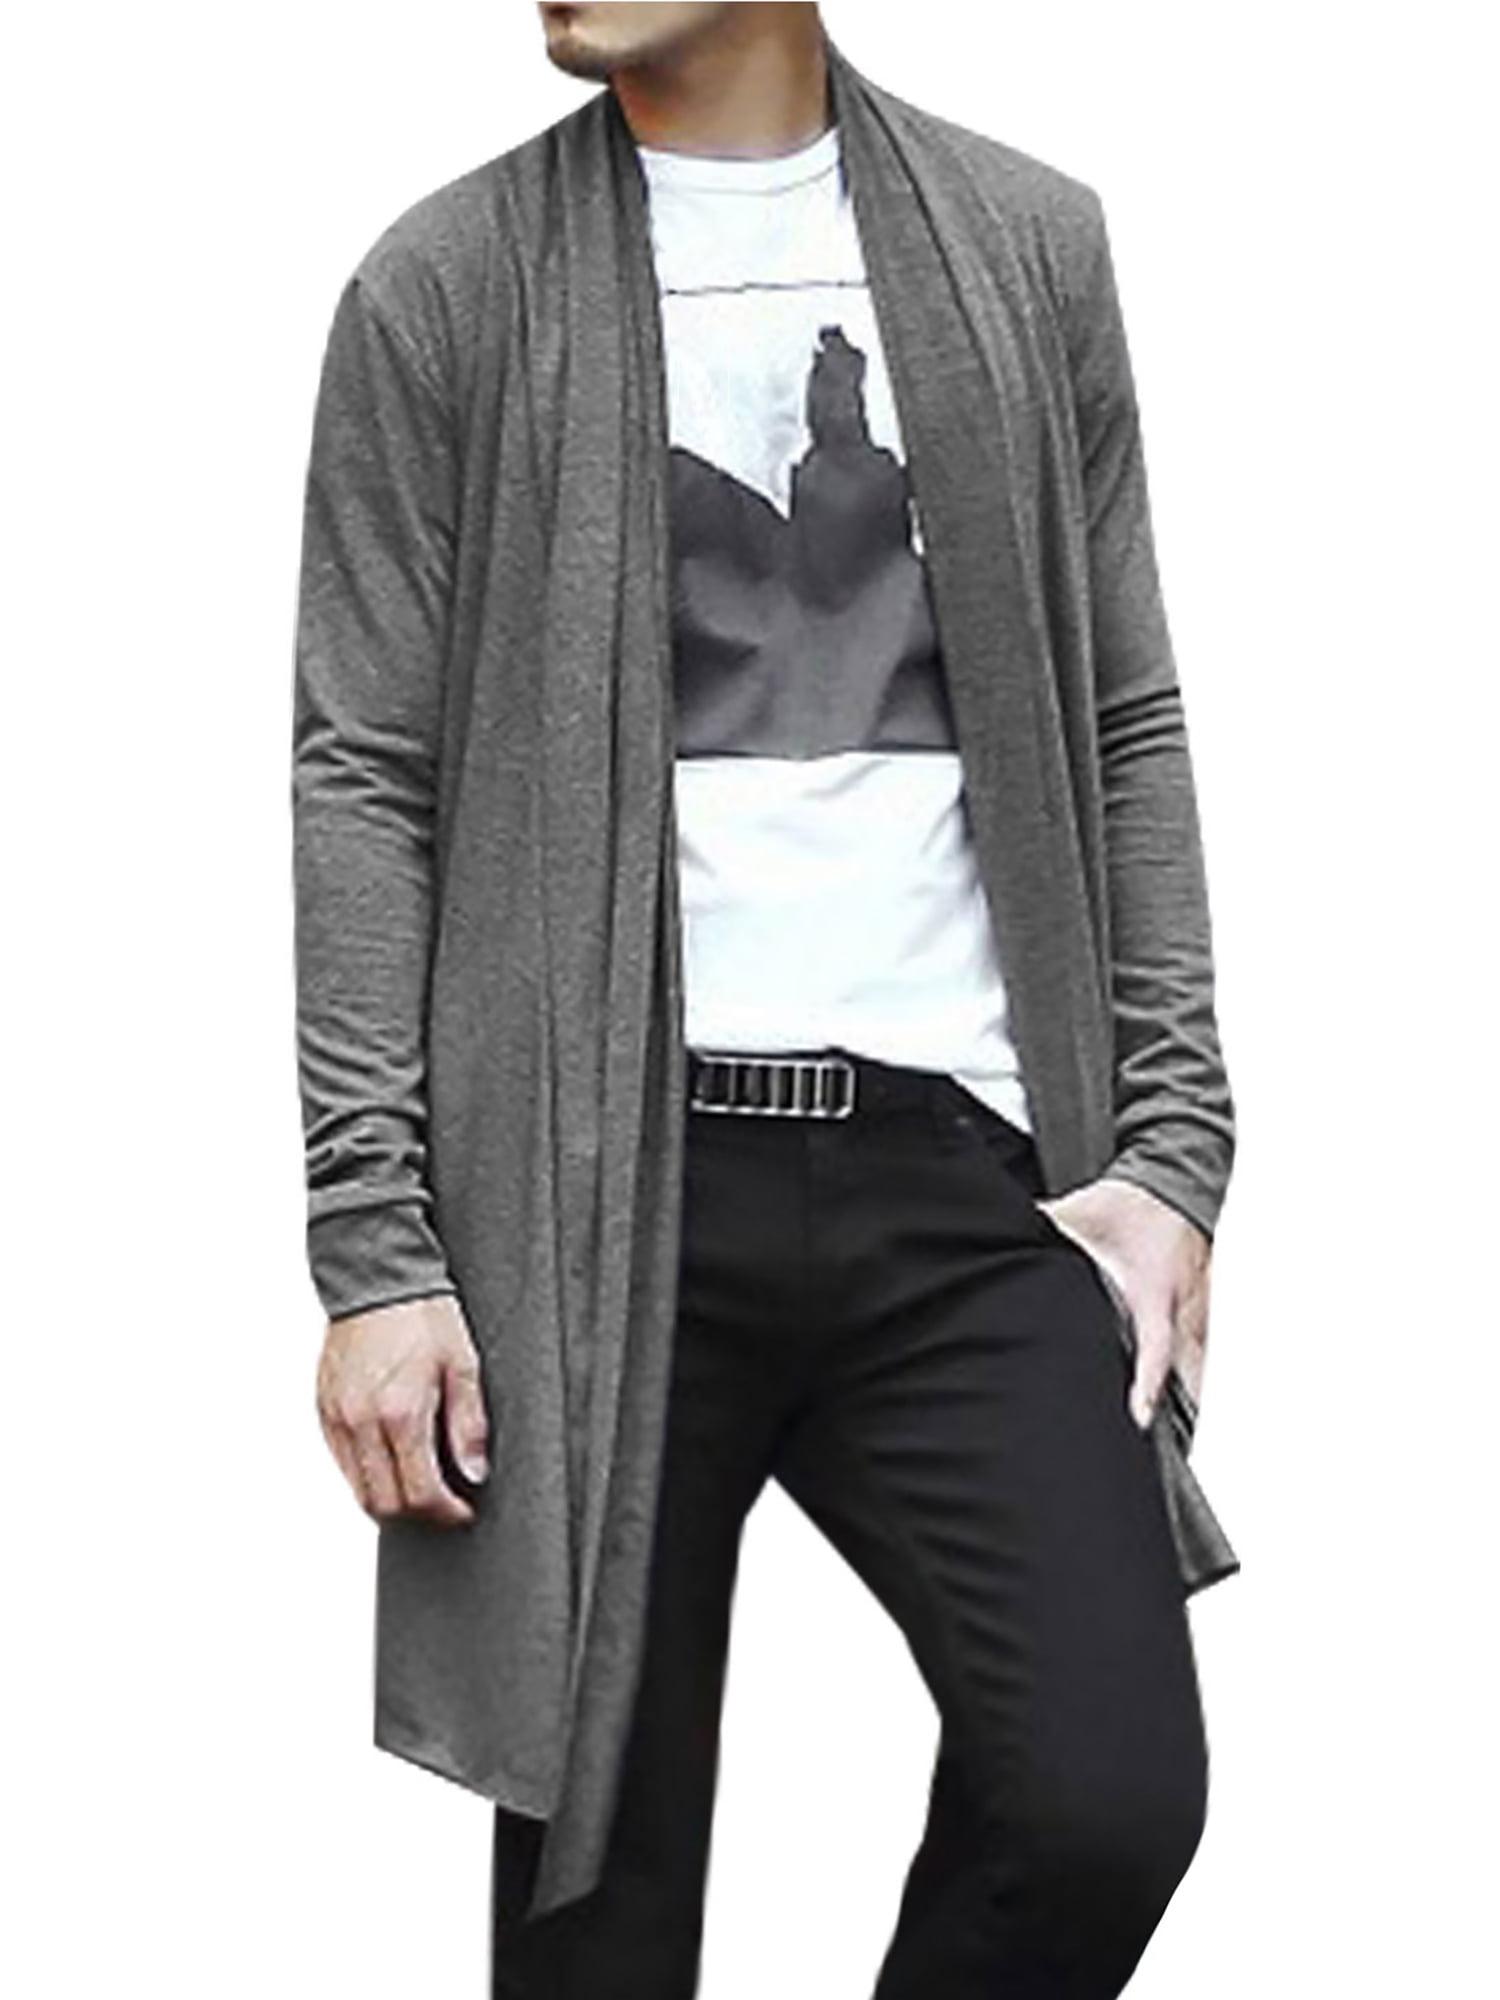 Unique Bargains Men's Shawl Collar Open Front Pockets High-Low Hem Long Cardigan Gray (Size L / 44)